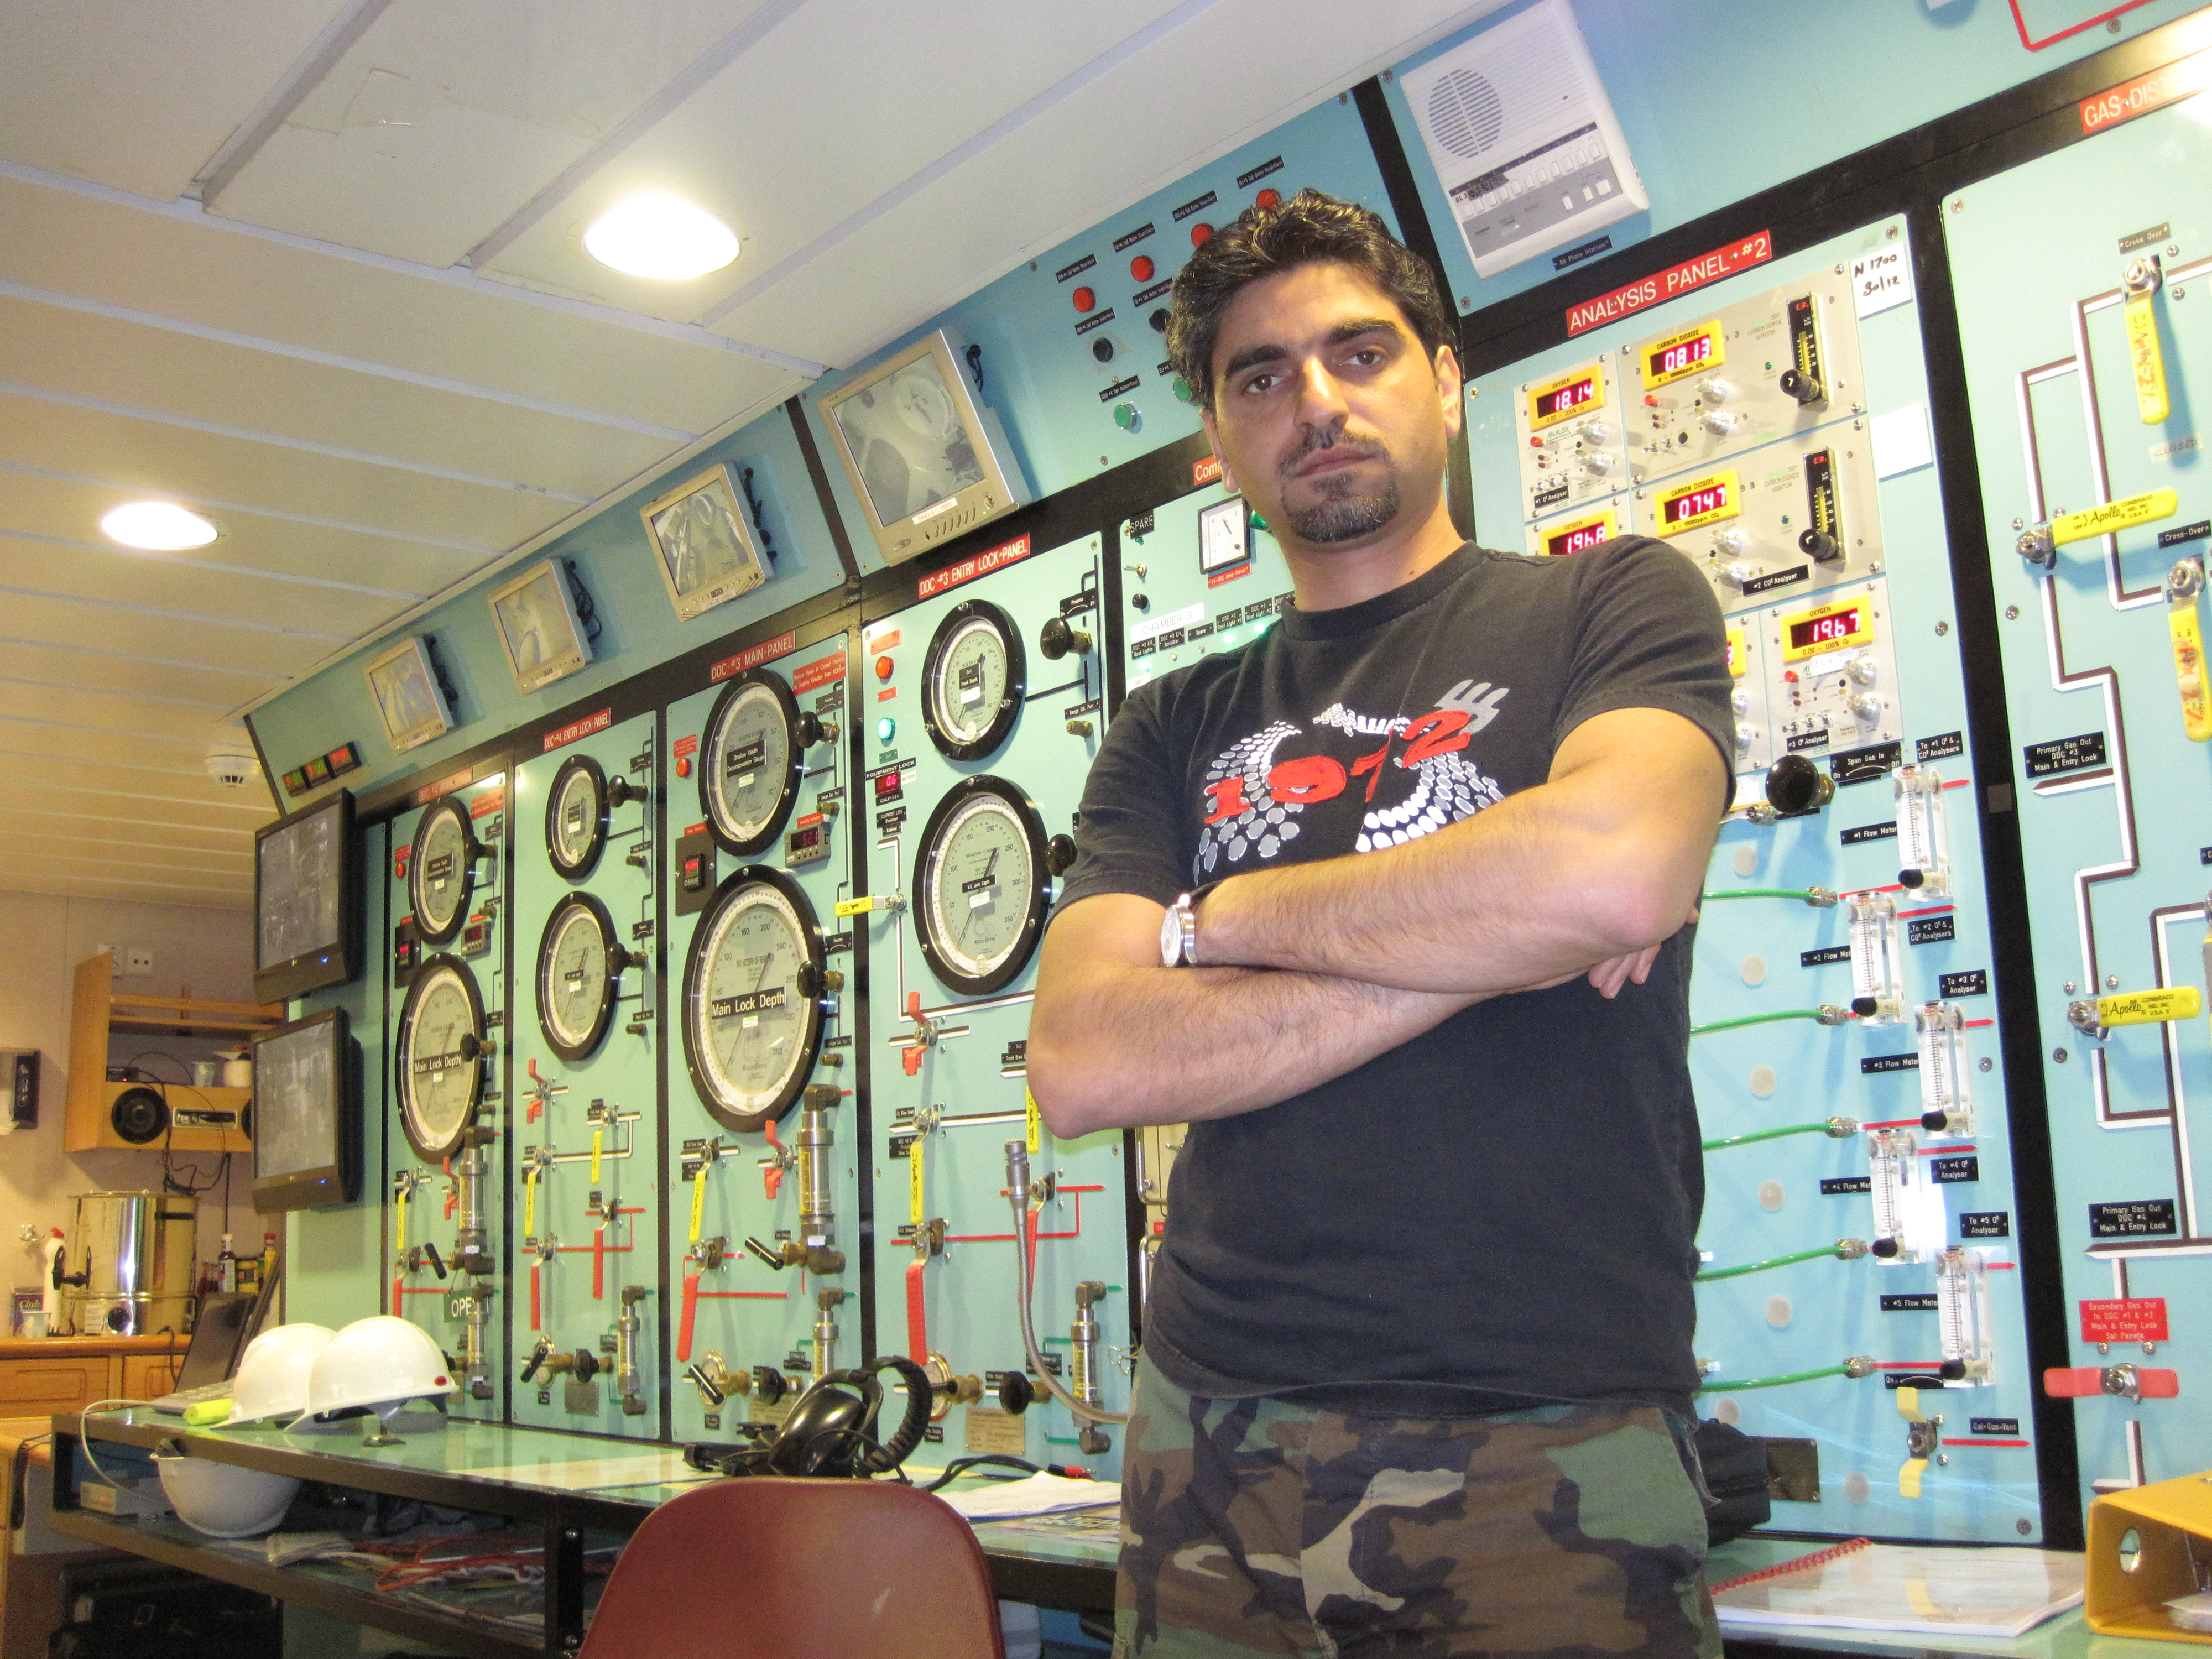 Youssef Abou Kashef